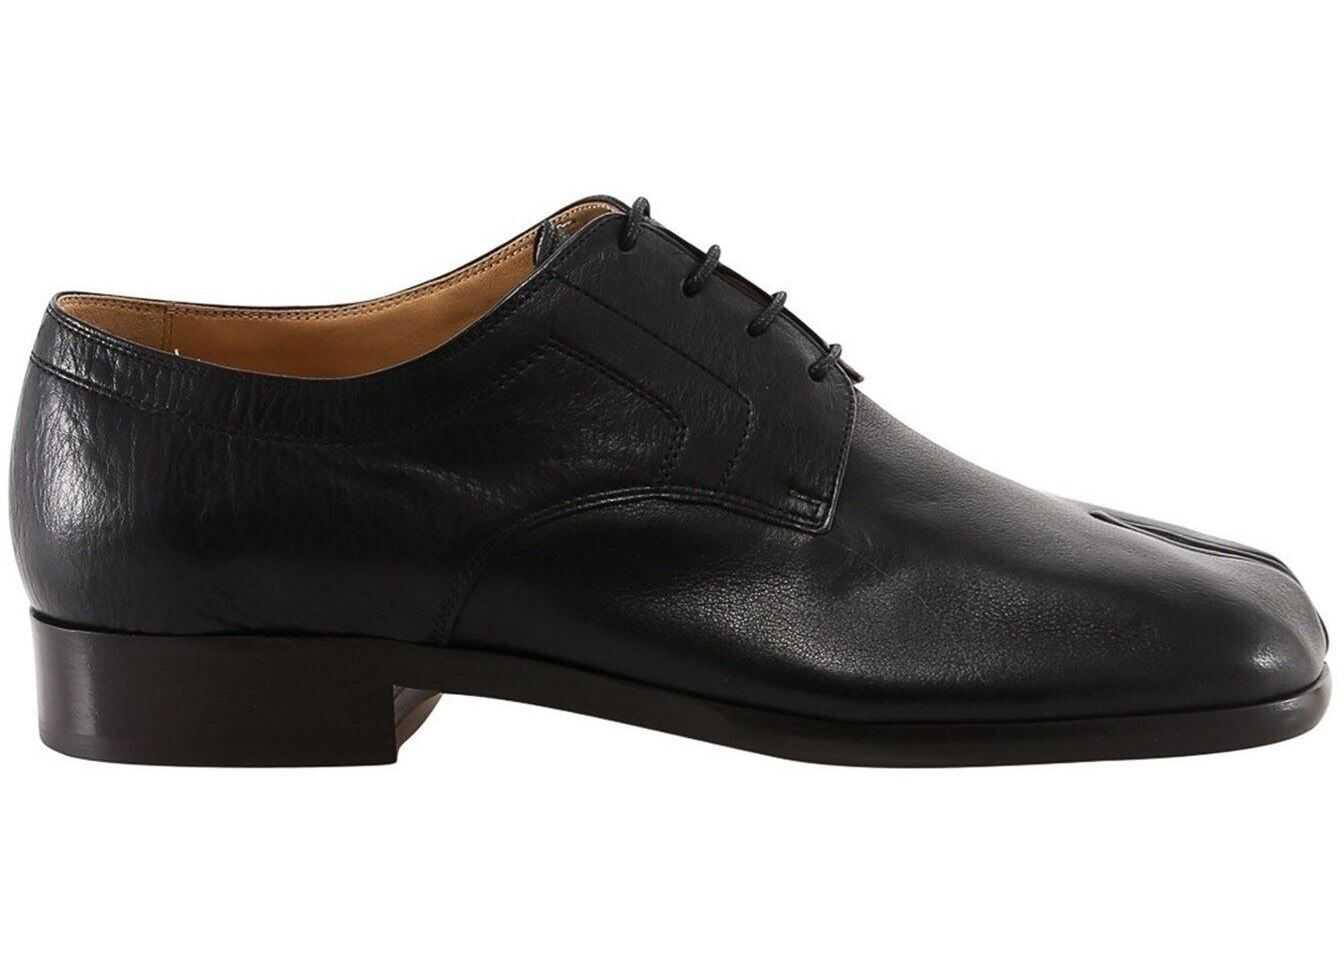 Maison Margiela Tabi Thong Lace-Up Shoes S37WQ0319 P2696 T8013 Black imagine b-mall.ro